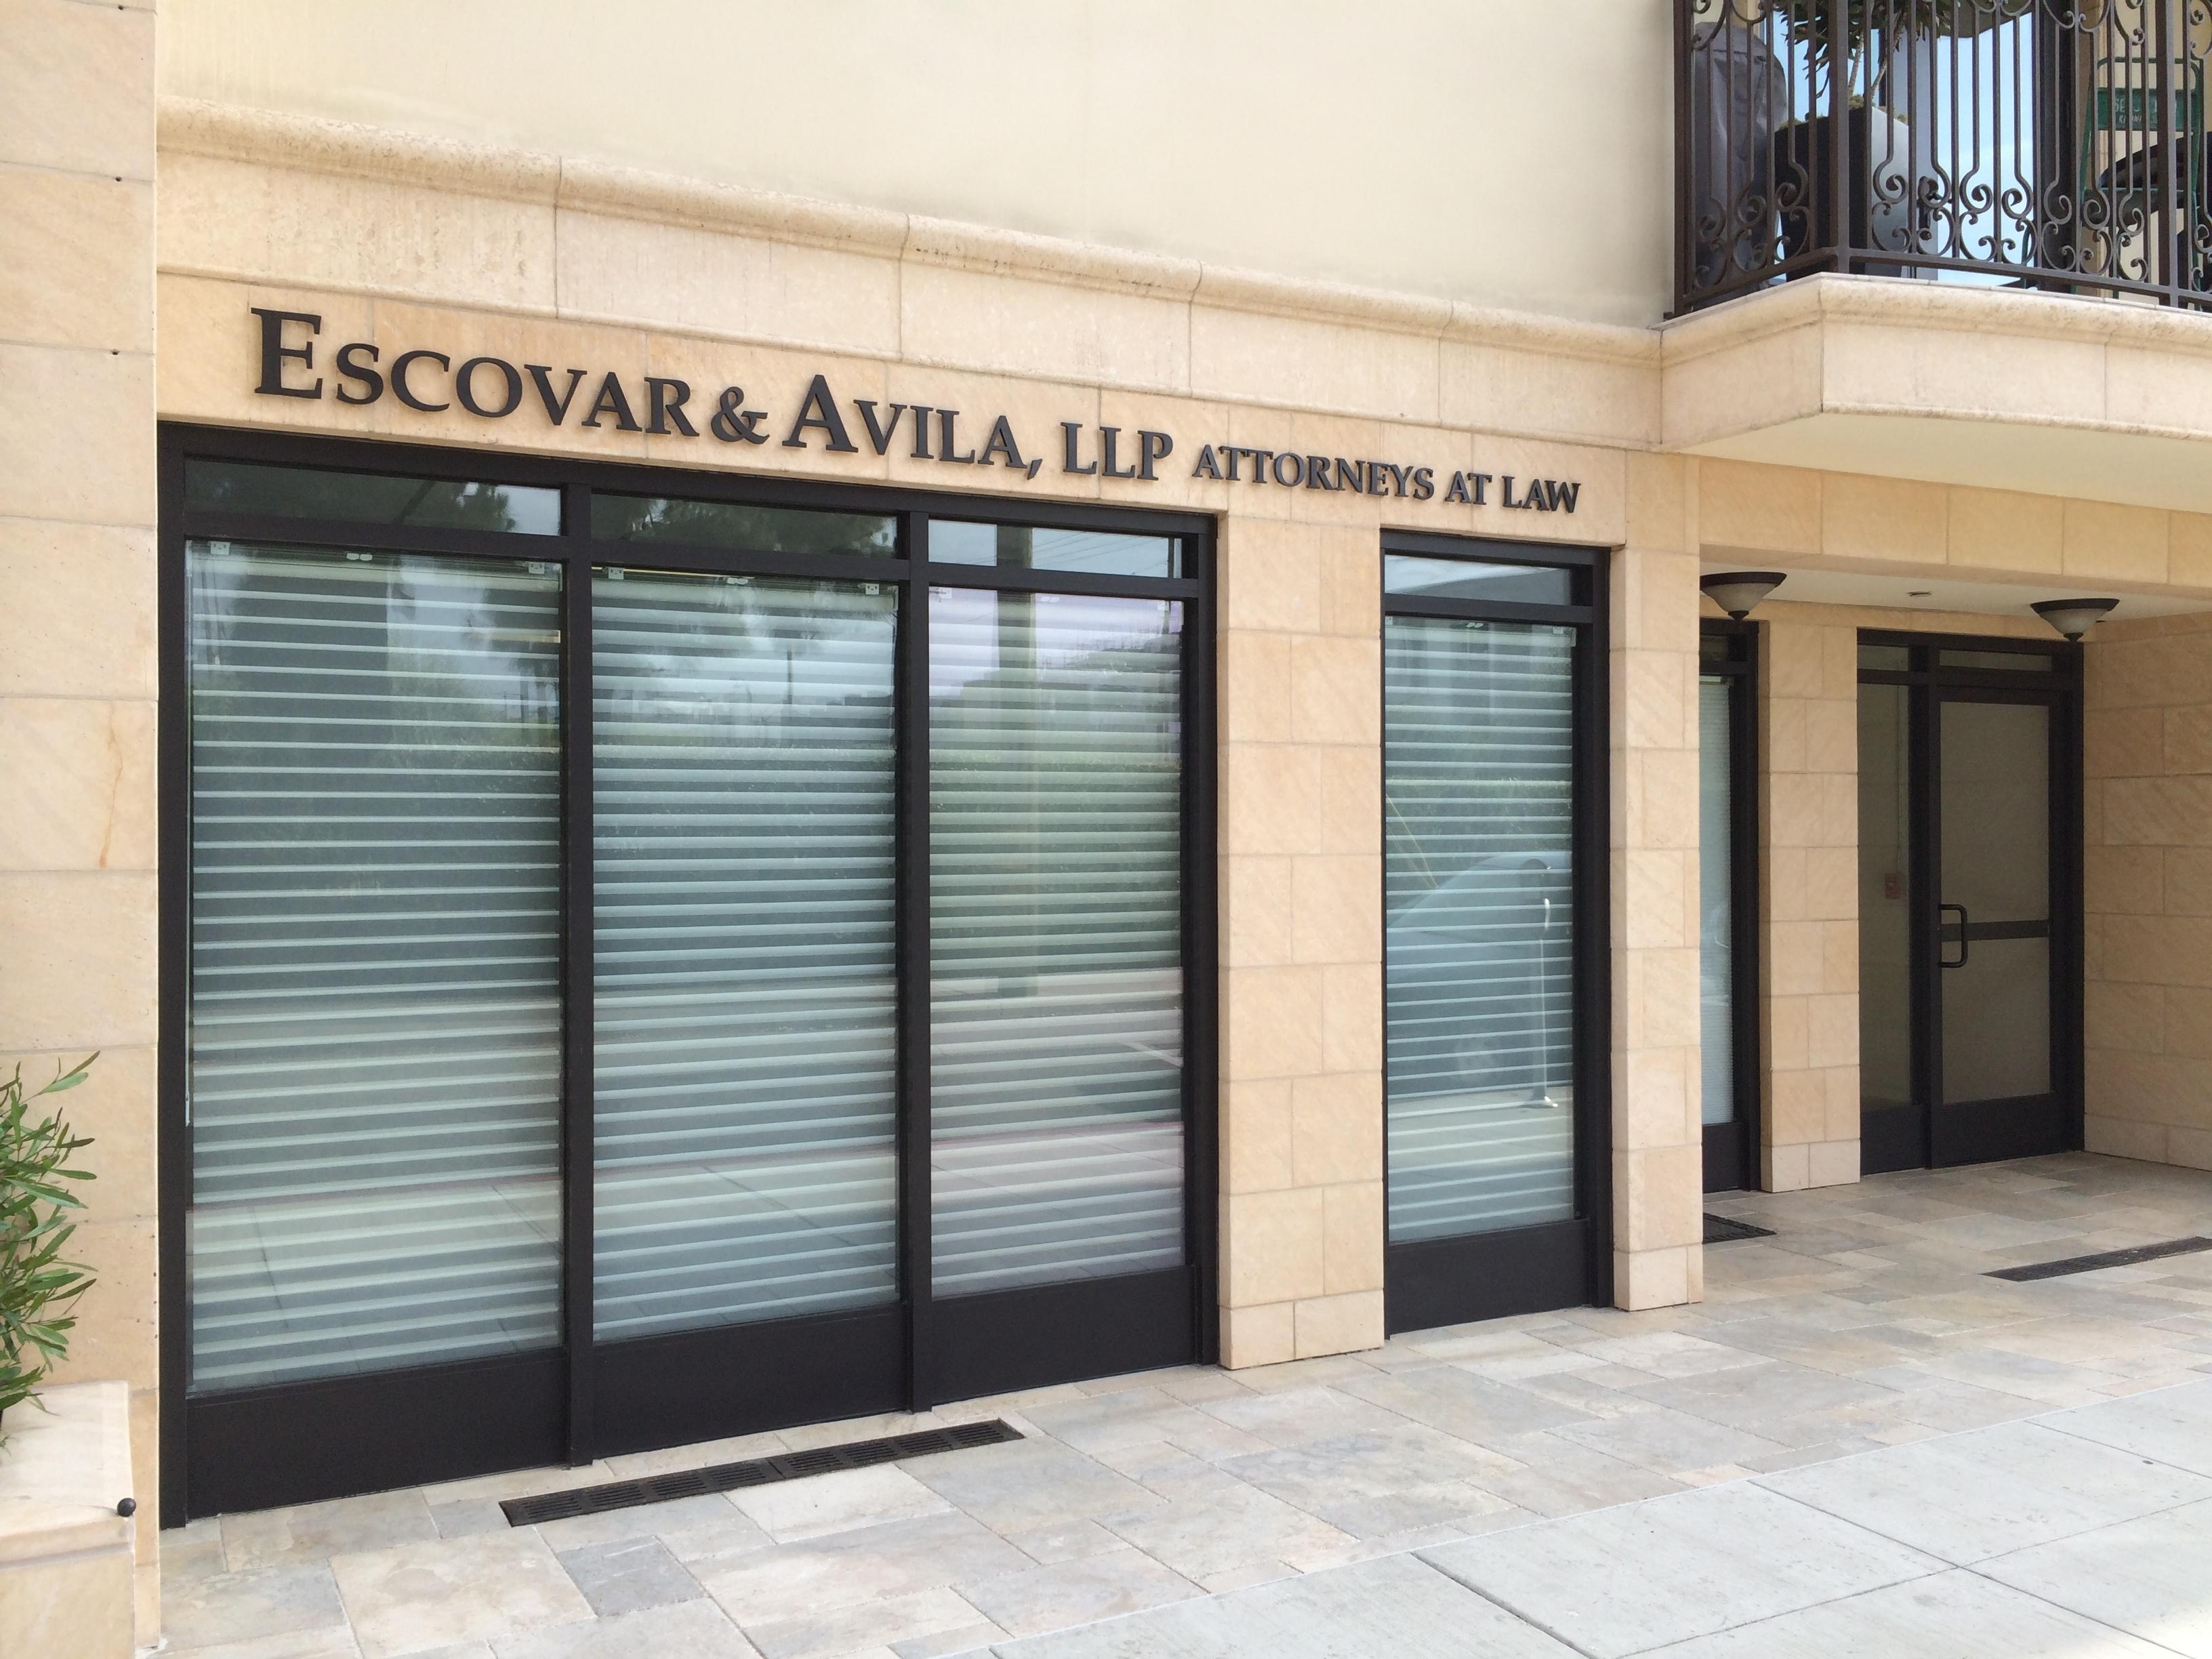 Escovar & Avila, LLP - ad image